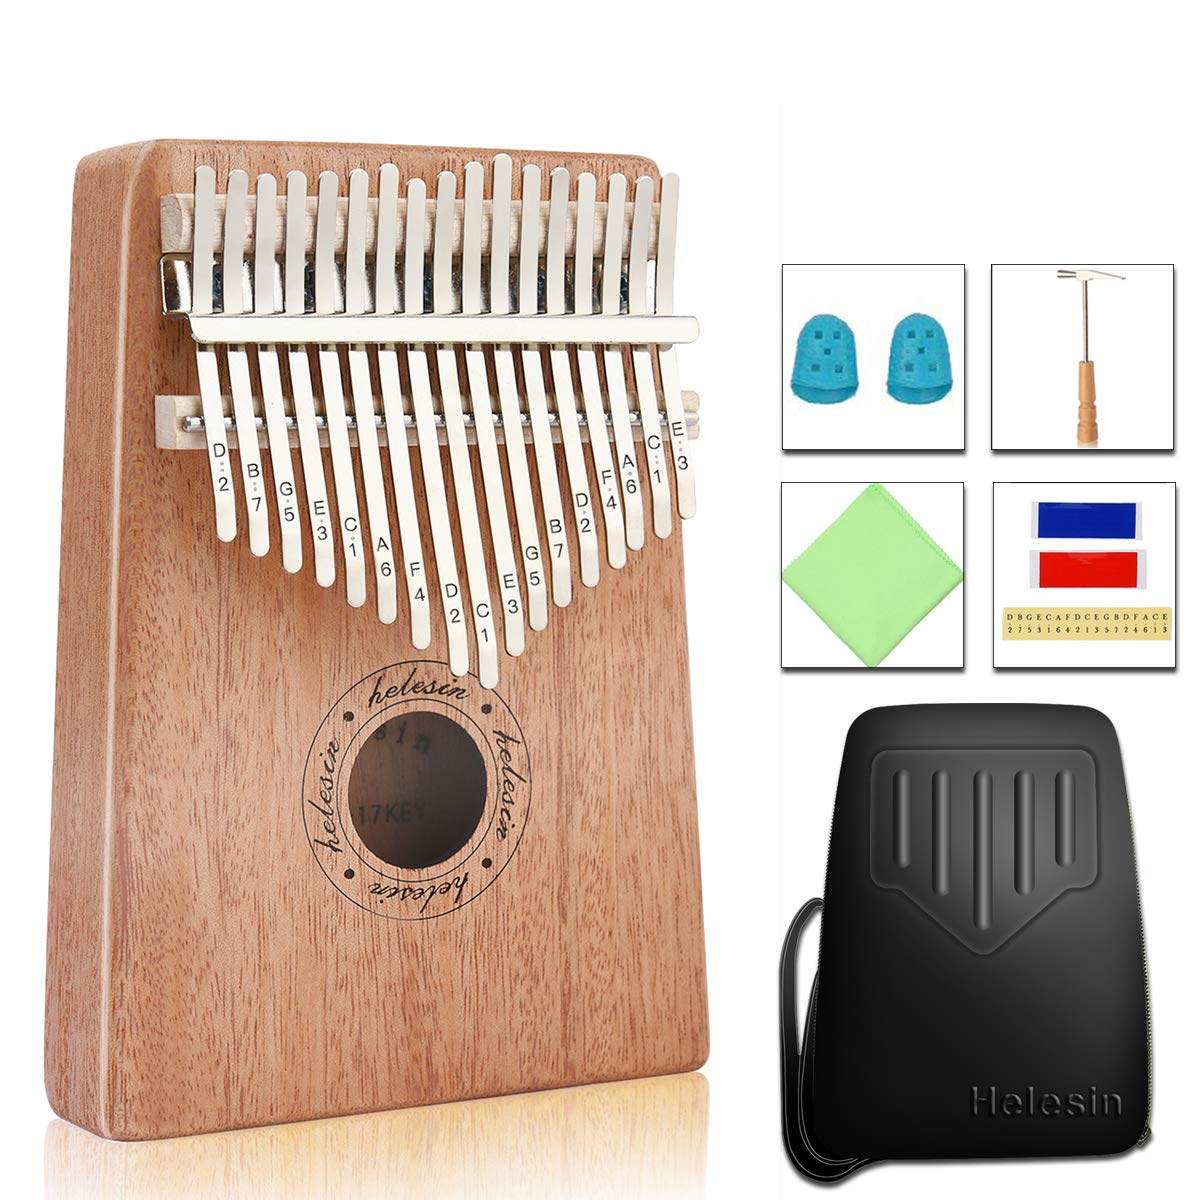 Kalimba 17 Key Thumb Piano, Solid Mahogany Body Finger Piano Mbira with EVA Waterproof Protective Case, Birthday Gift for Kids Adult Beginners